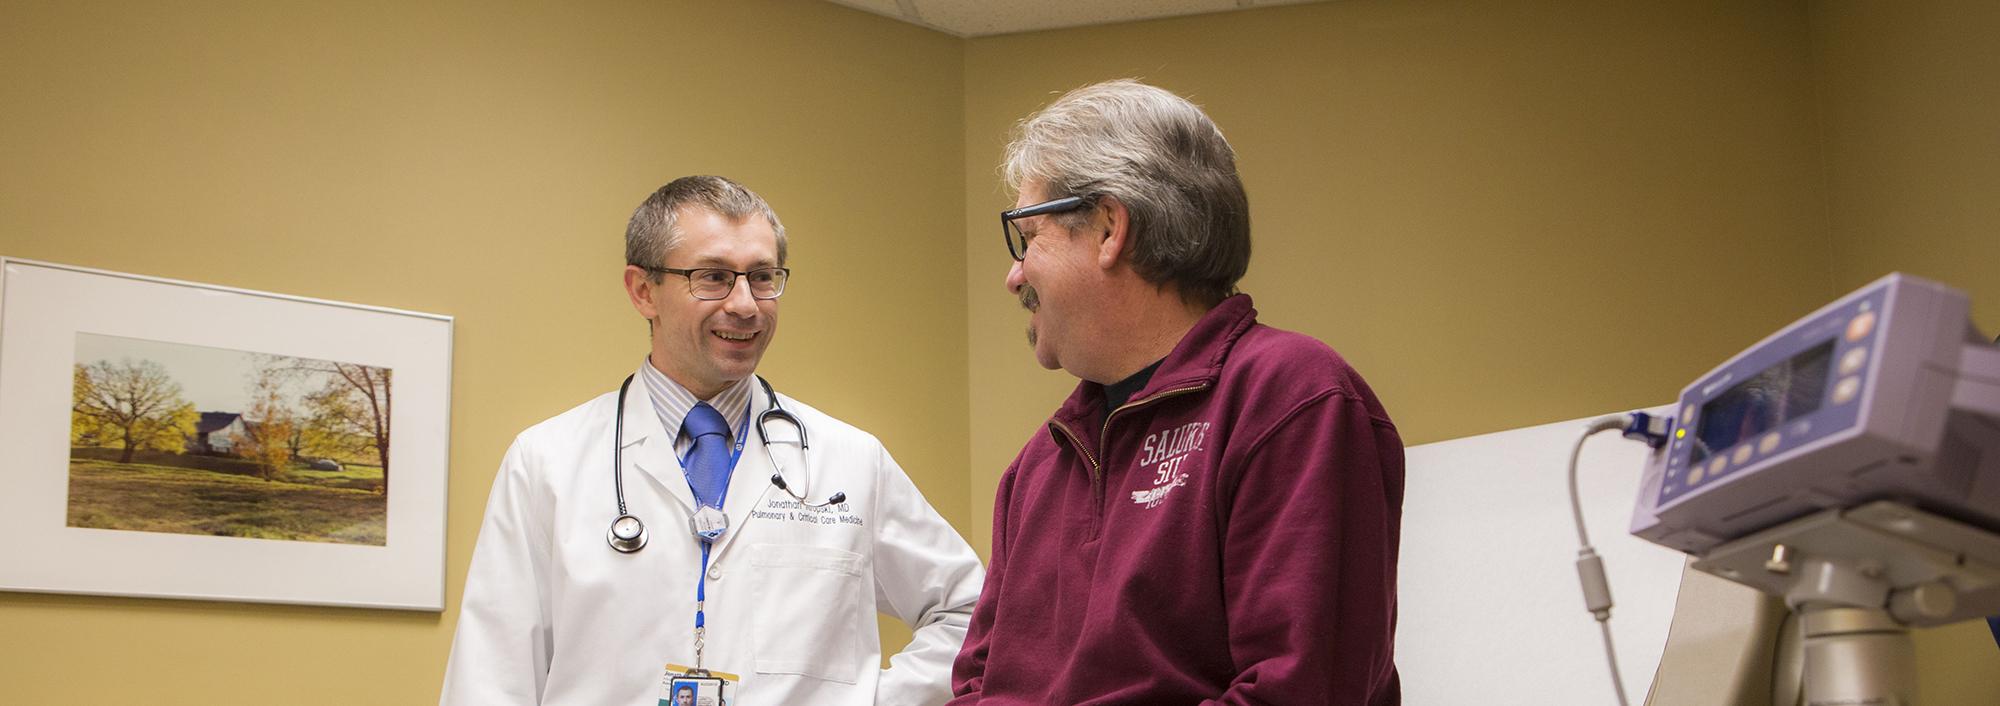 Dr. Jonathan Kropski wit IPF Patient